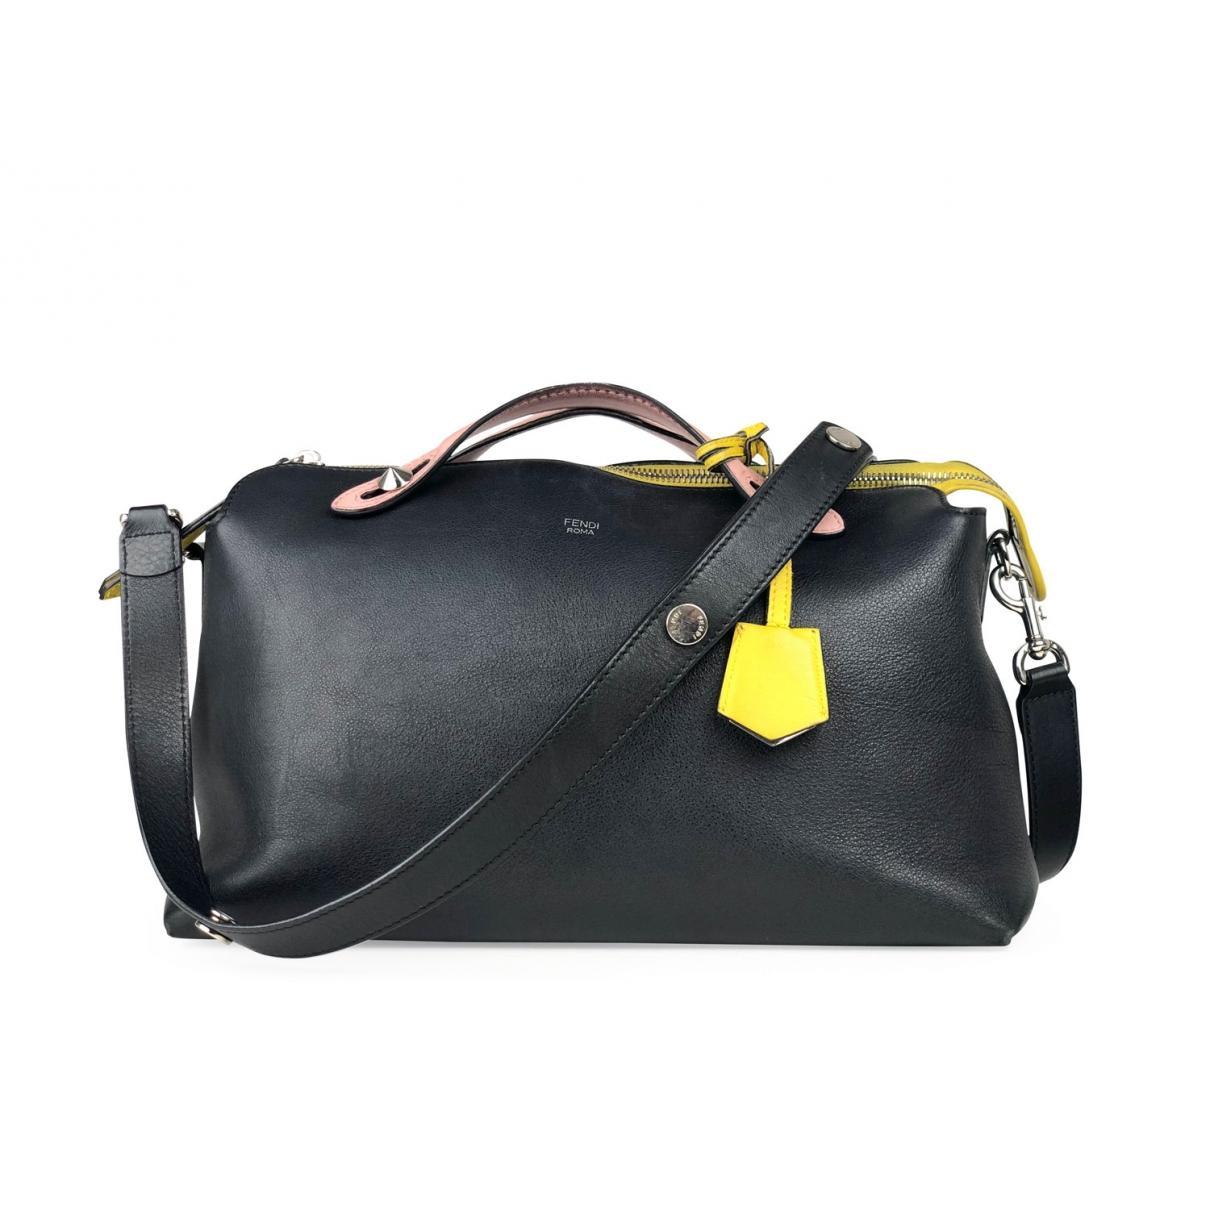 Lyst - Fendi By The Way Leather Handbag in Black